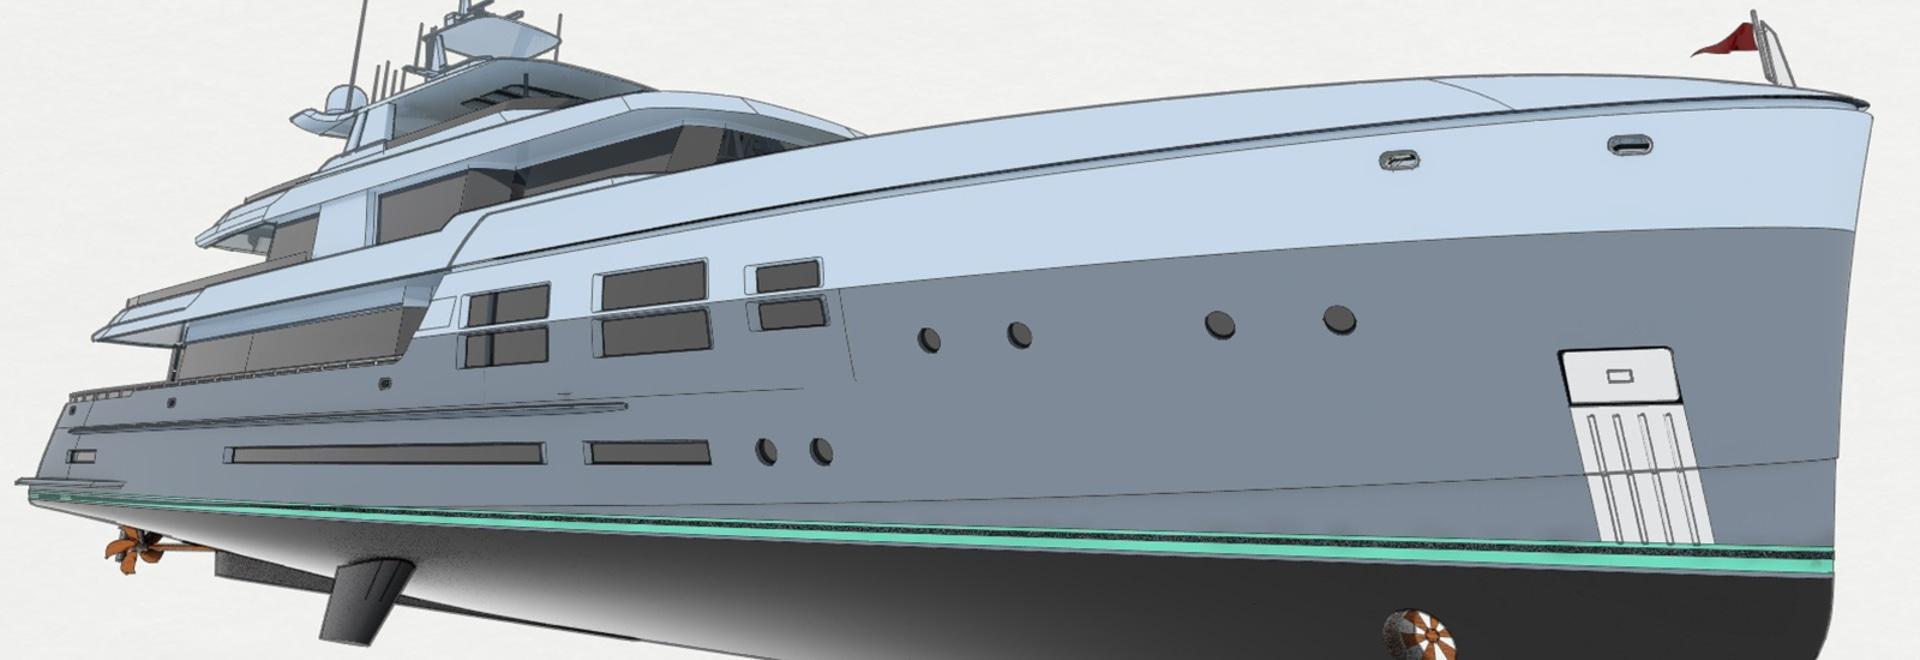 "DLBA Presents 45 Metre ""Radical"" Explorer Yacht Concept"